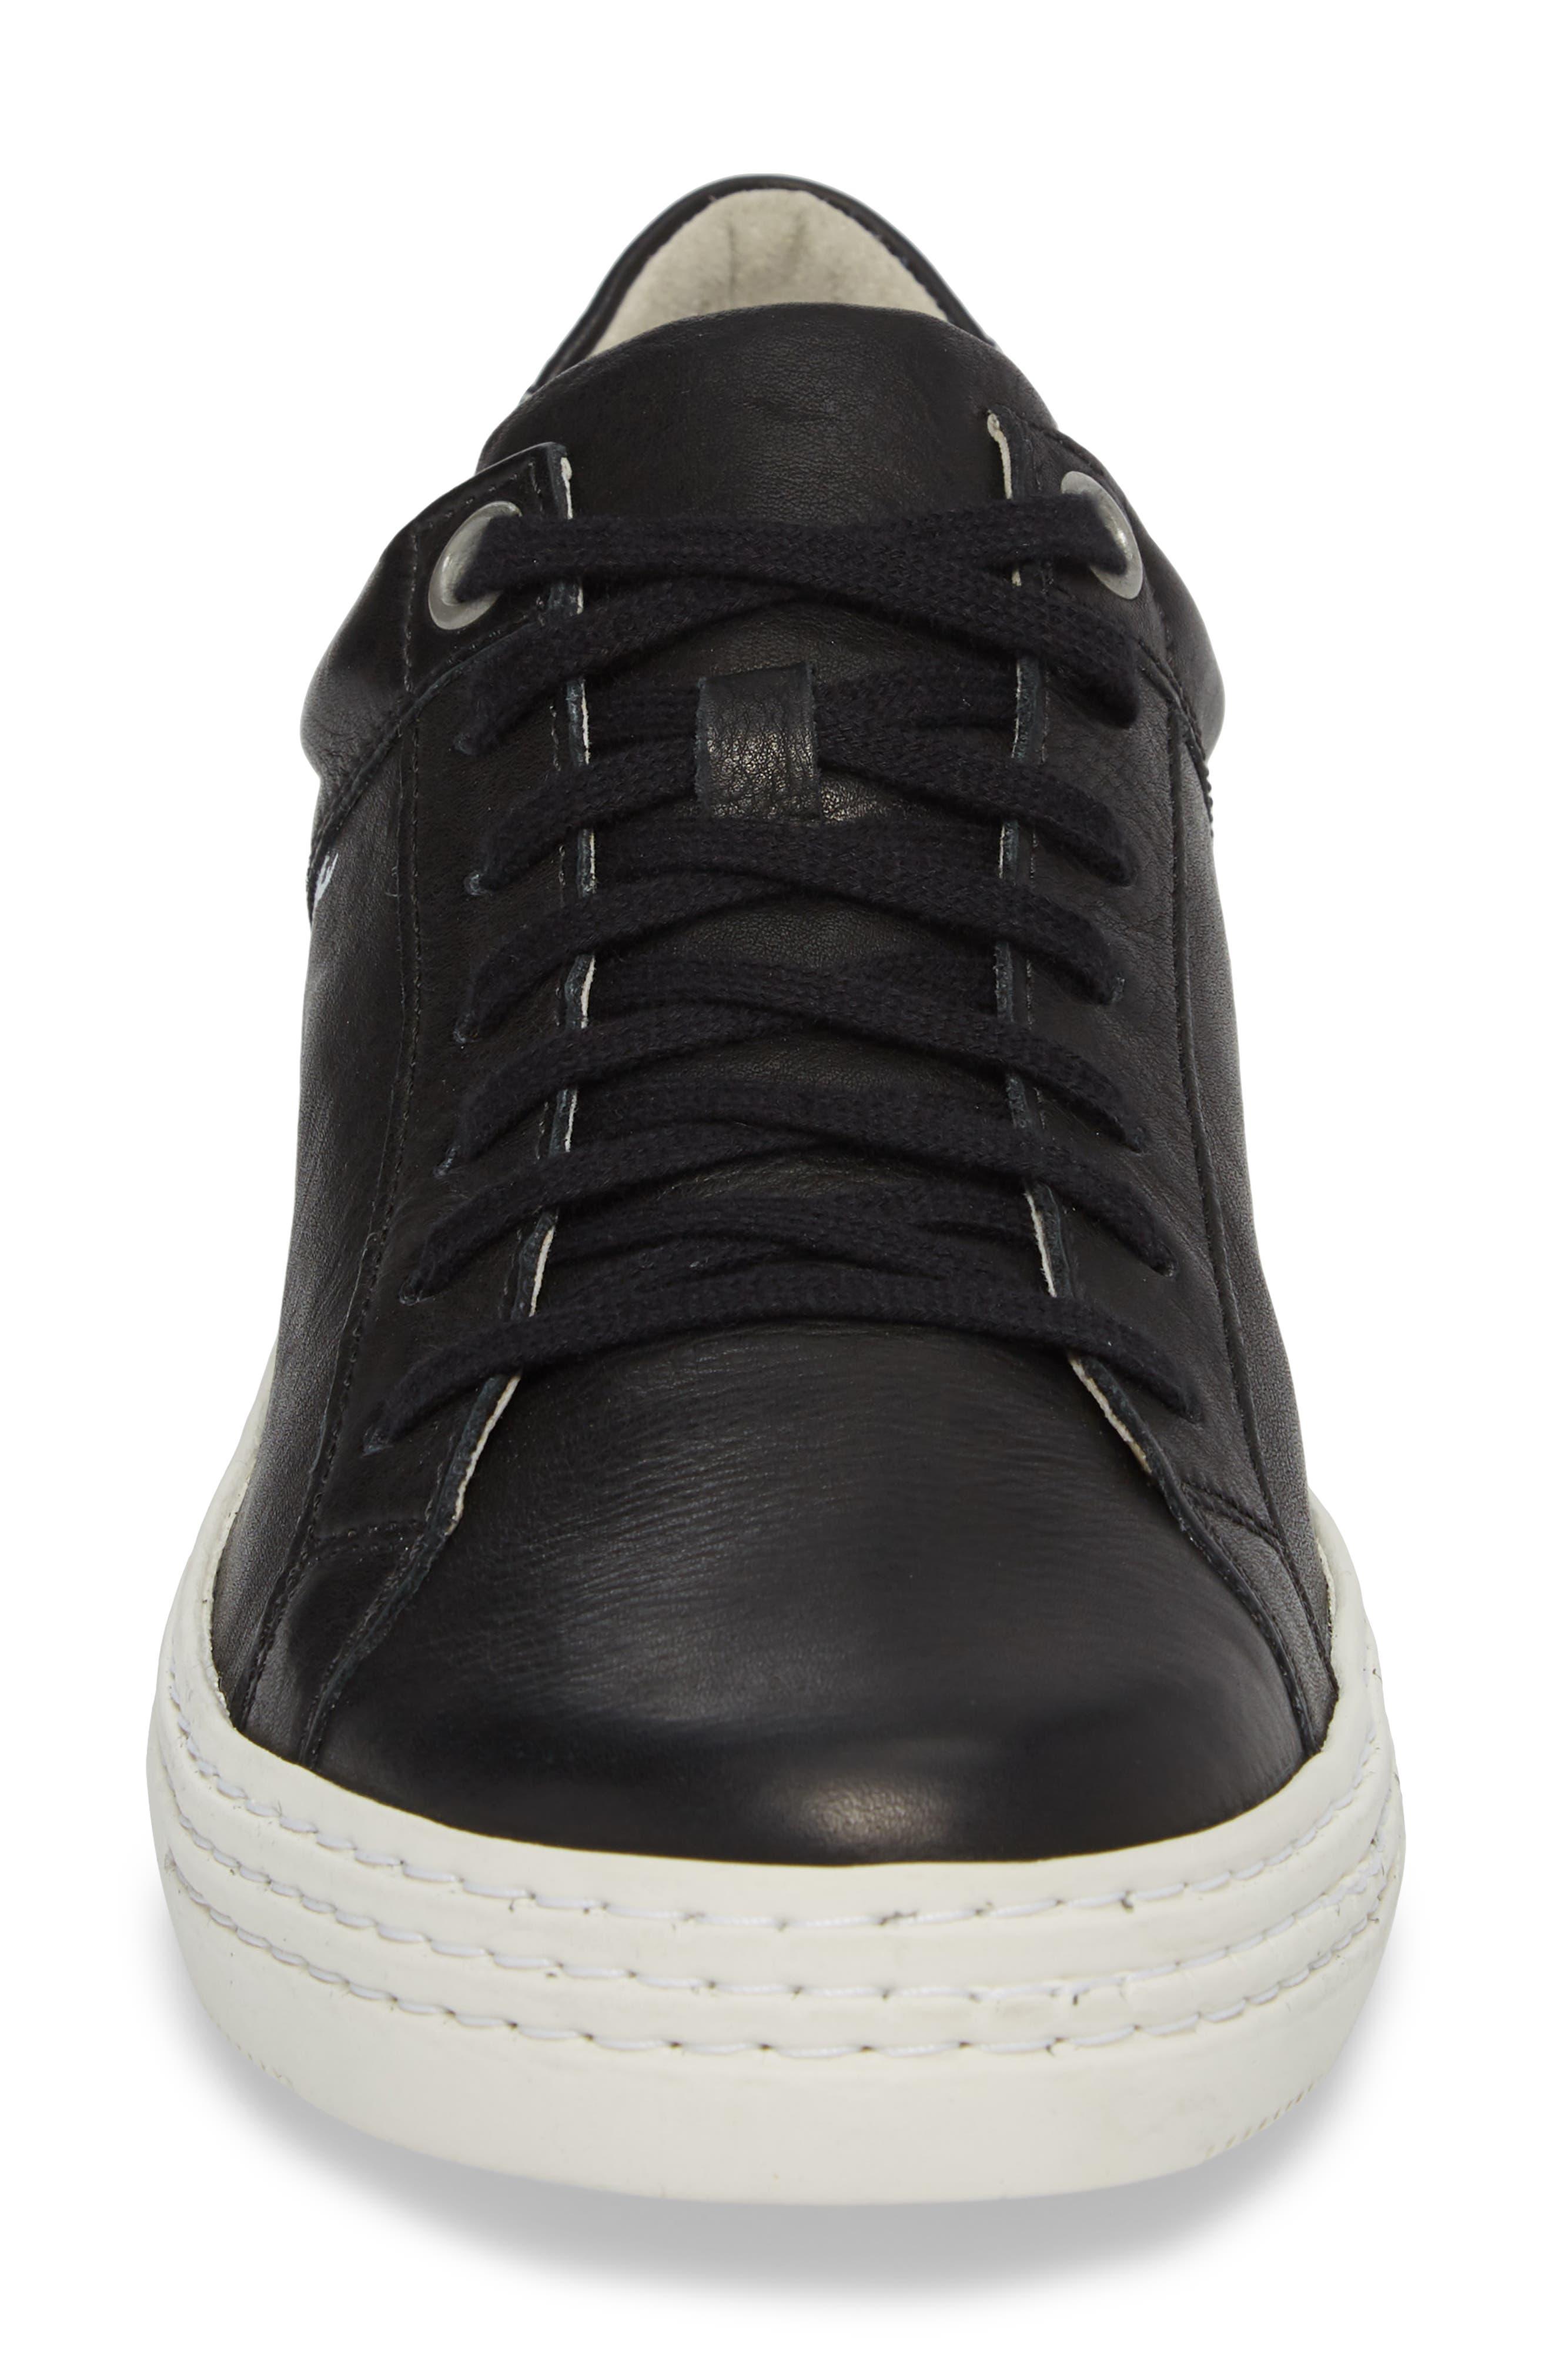 Sene Low Top Sneaker,                             Alternate thumbnail 4, color,                             BLACK LEATHER